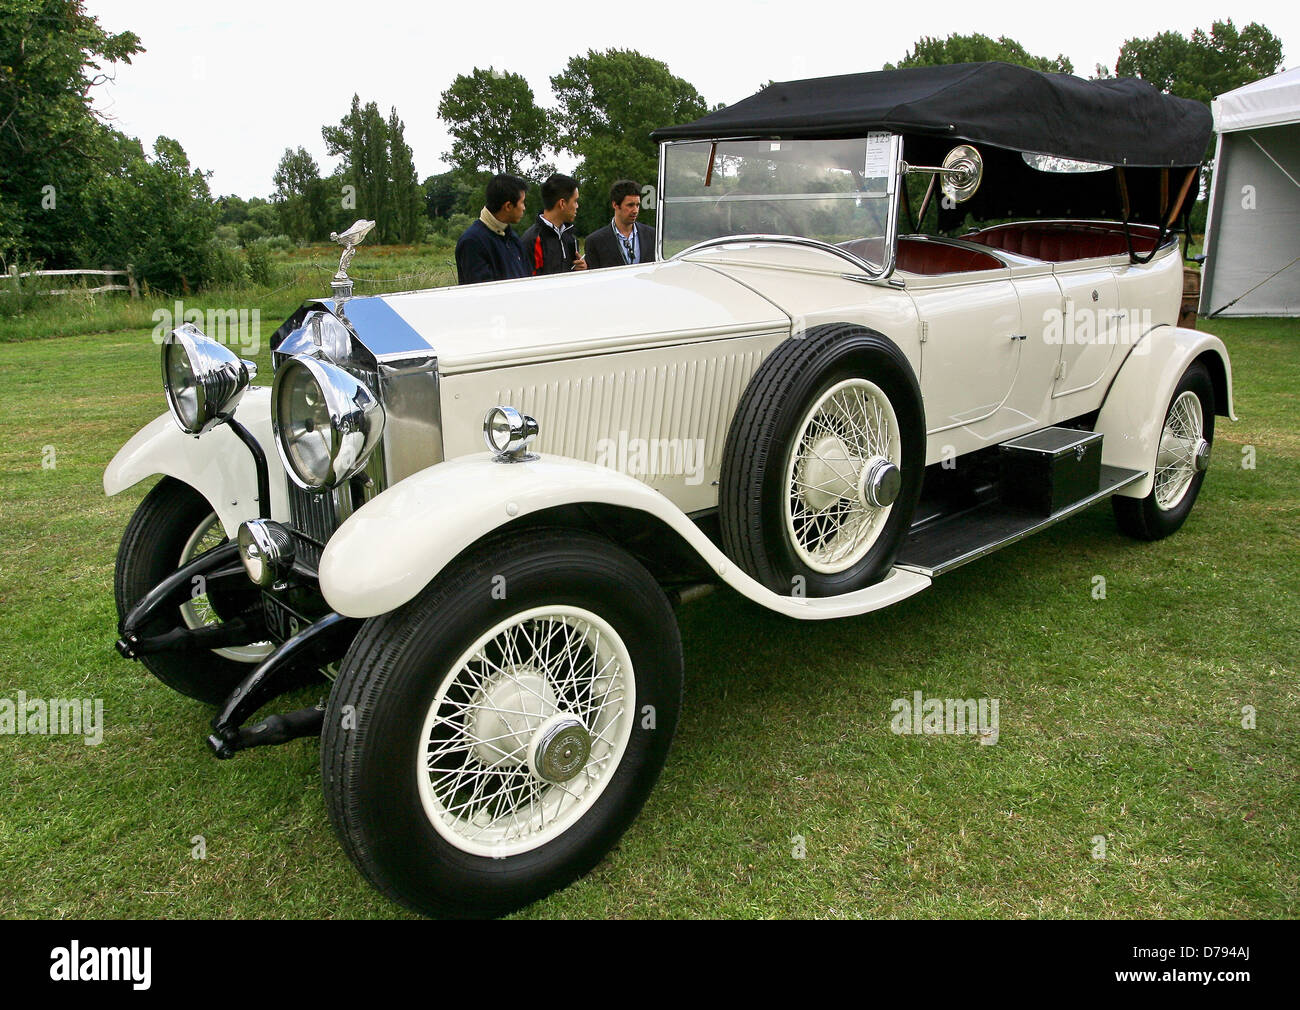 1925 Rolls Royce Phantom >> 1925 Rolls Royce Phantom Tourer 140 000 180 000 Day 3 Of